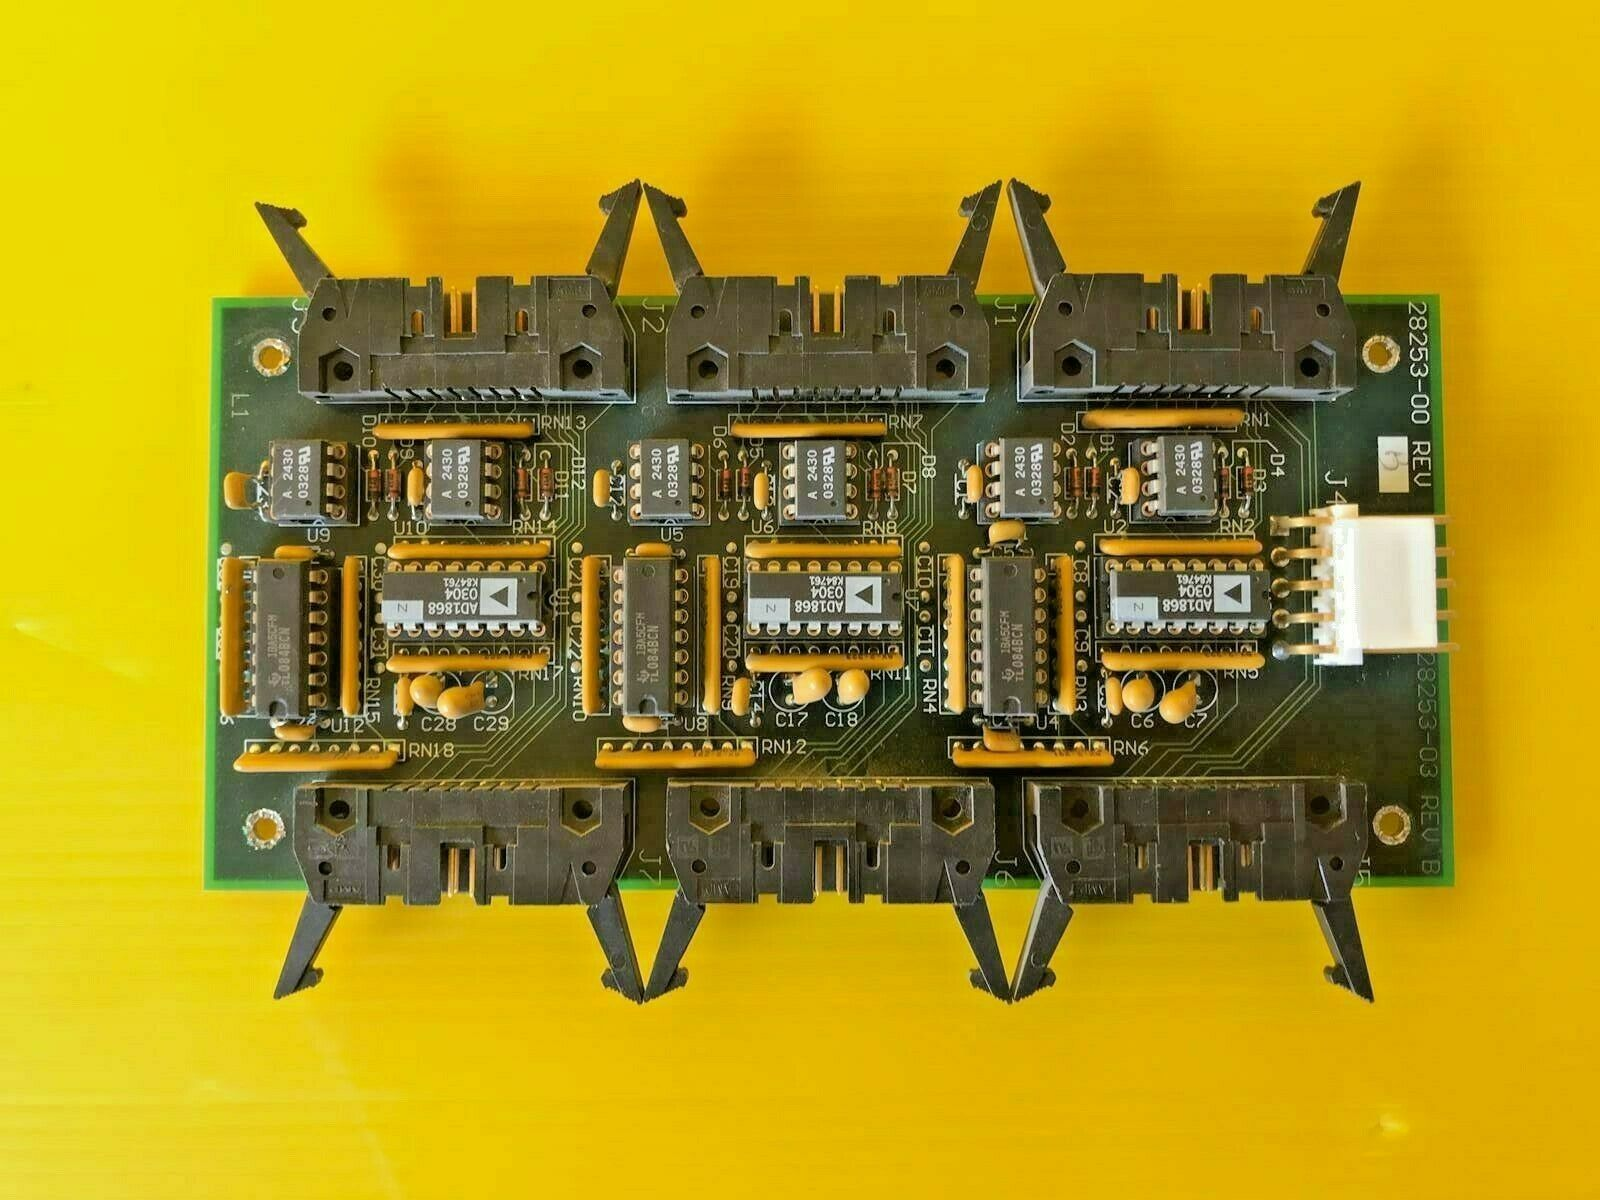 Dover Instrument Corp 28253-03 REV B 3-Chnl D A Converer 28253-00